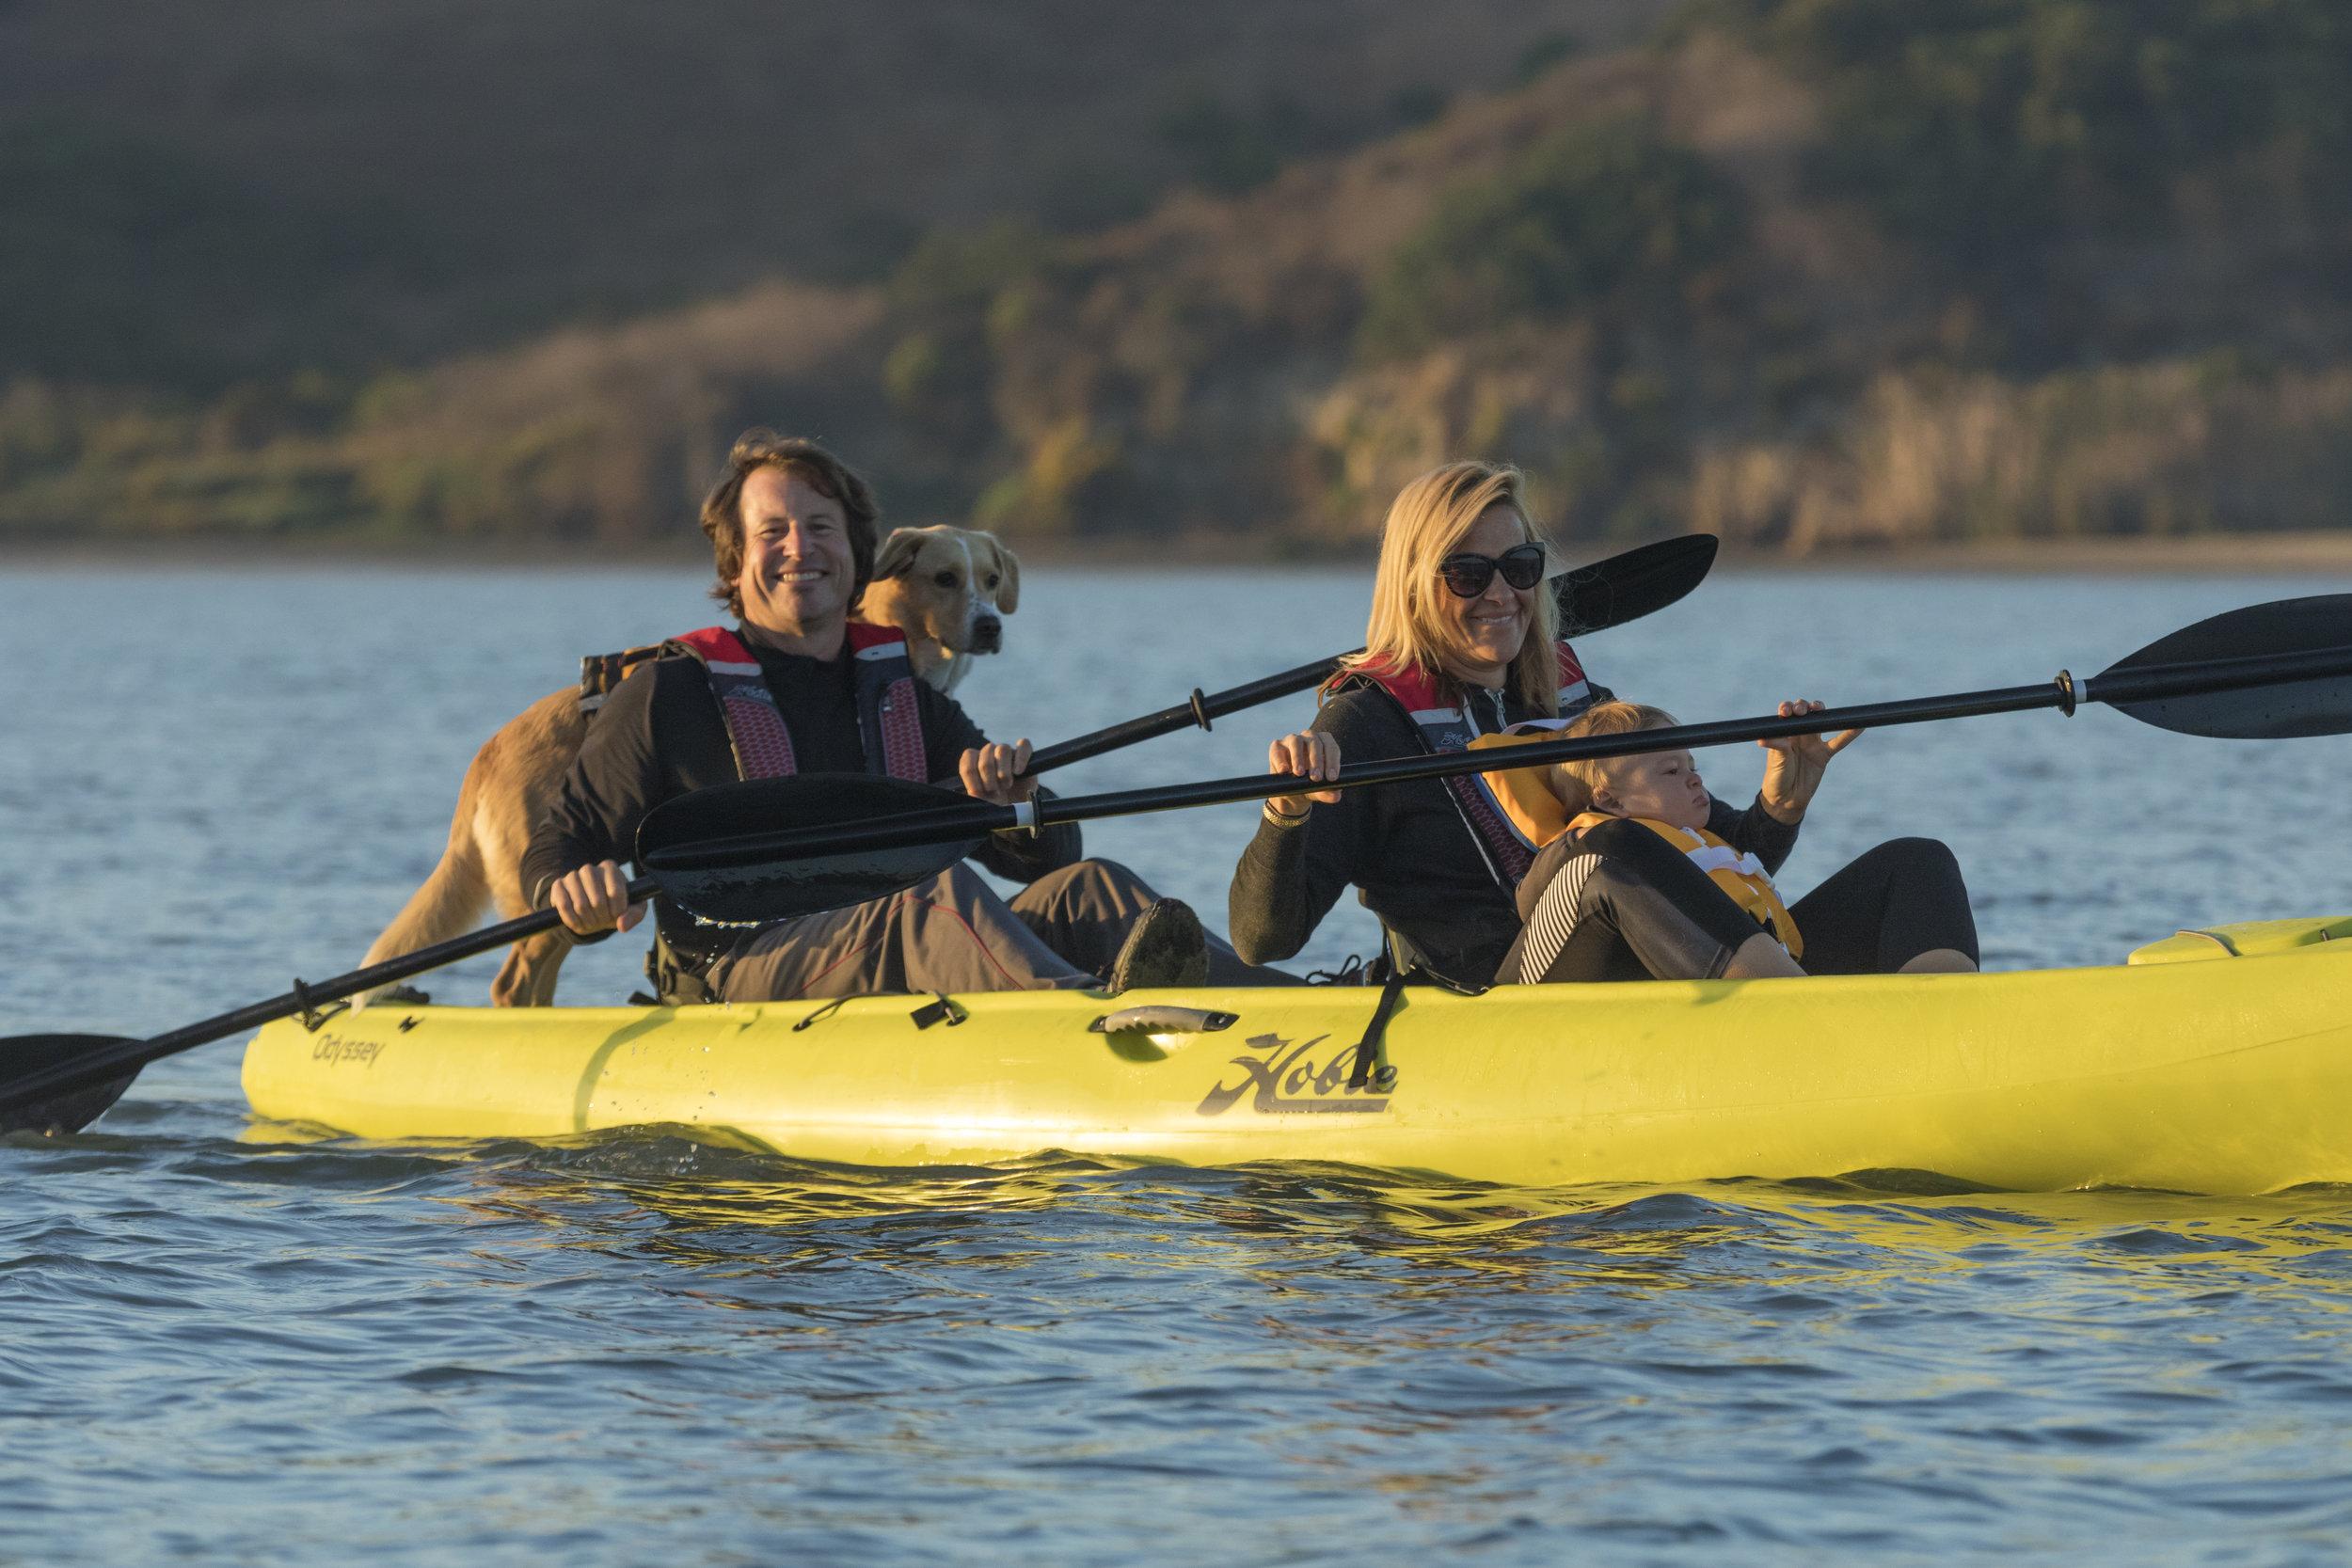 Odyssey_action_family_seagrass_lagoon_jim_dog_smiles.jpg